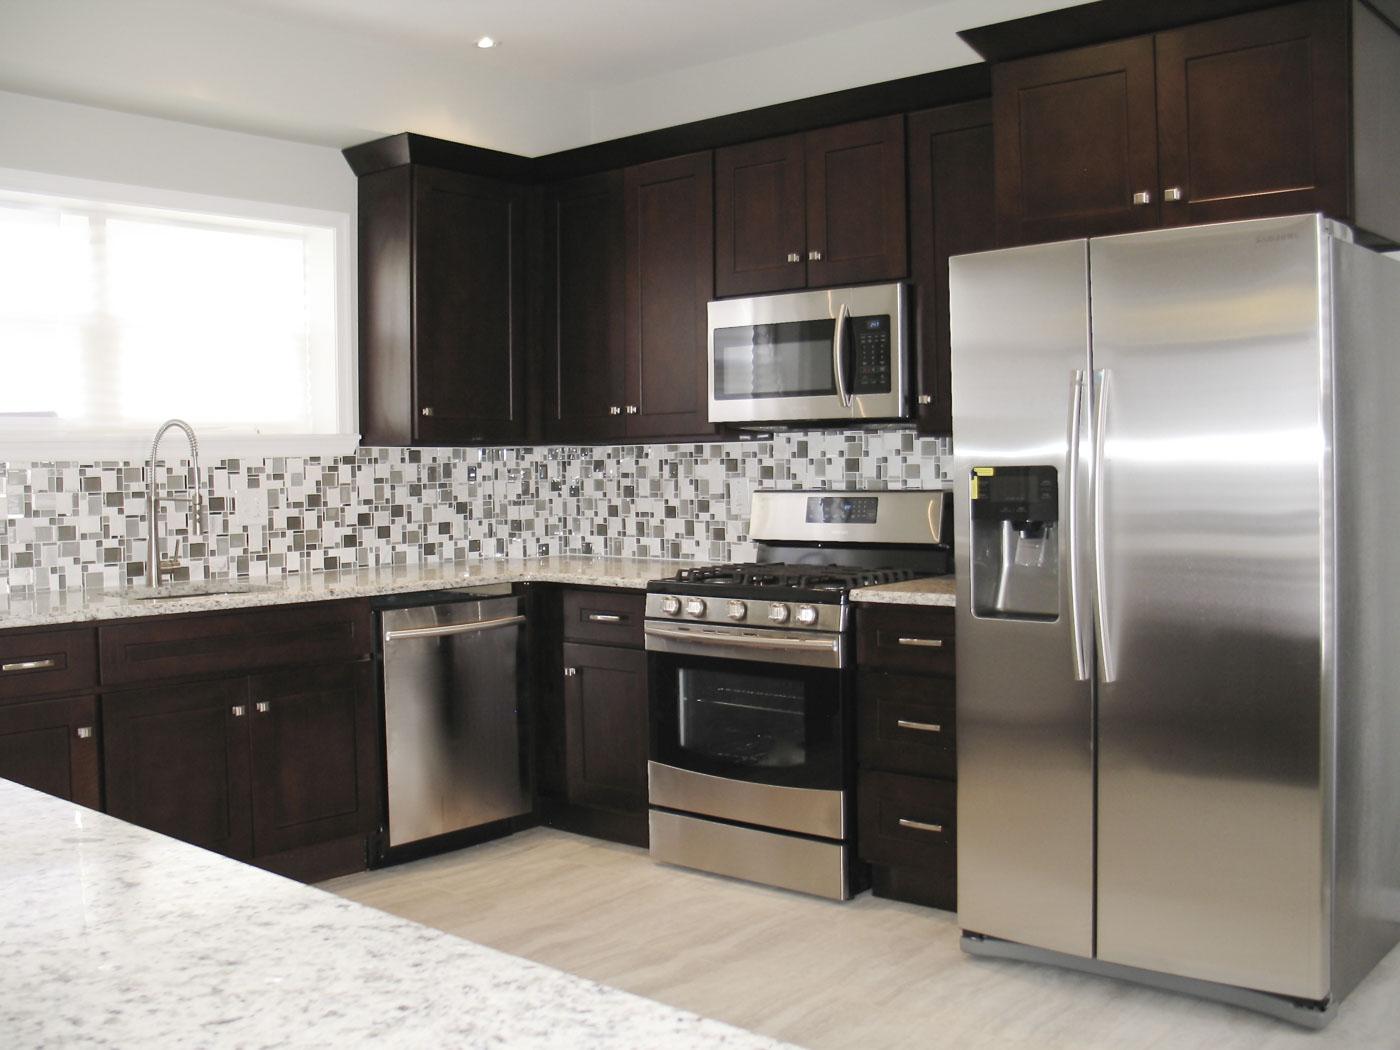 Espresso Shaker - Kitchen Cabinets